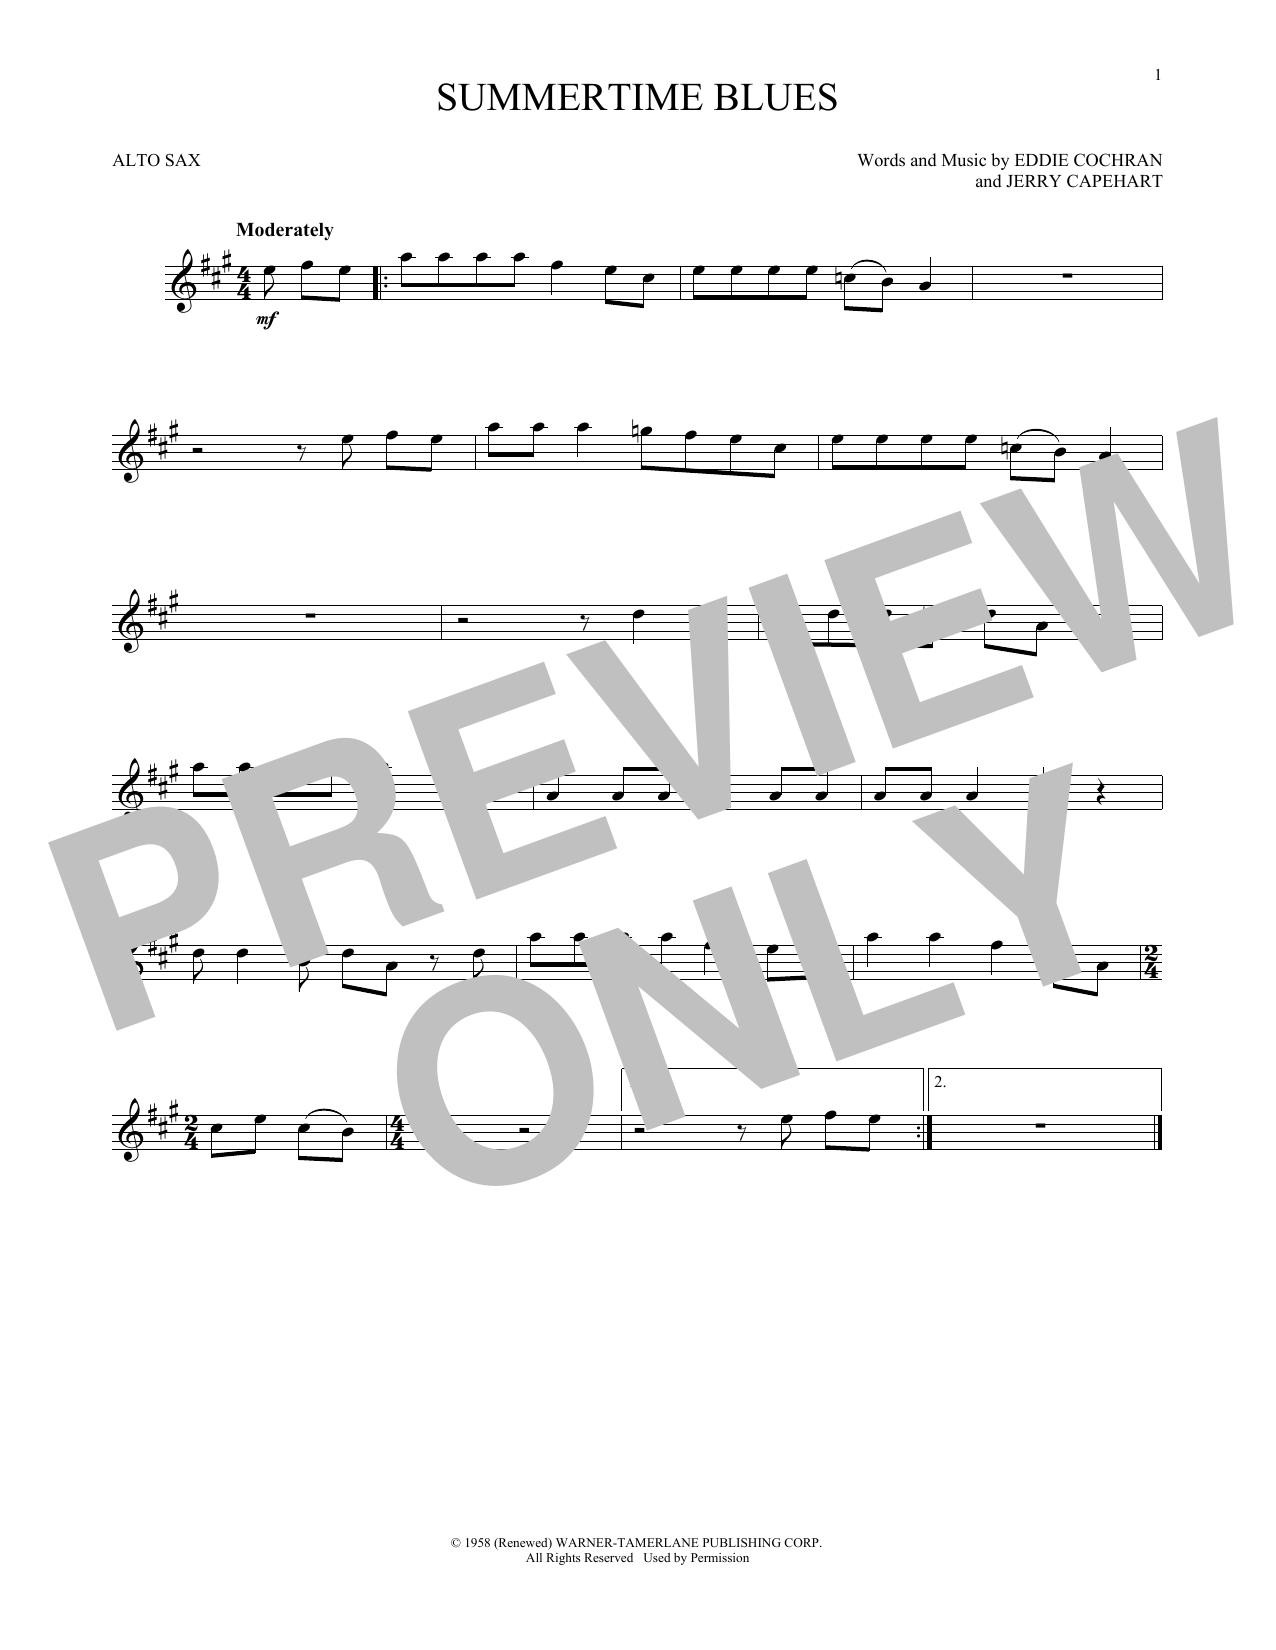 Summertime Blues saxophone sheet music by Eddie Cochran - Alto Sax